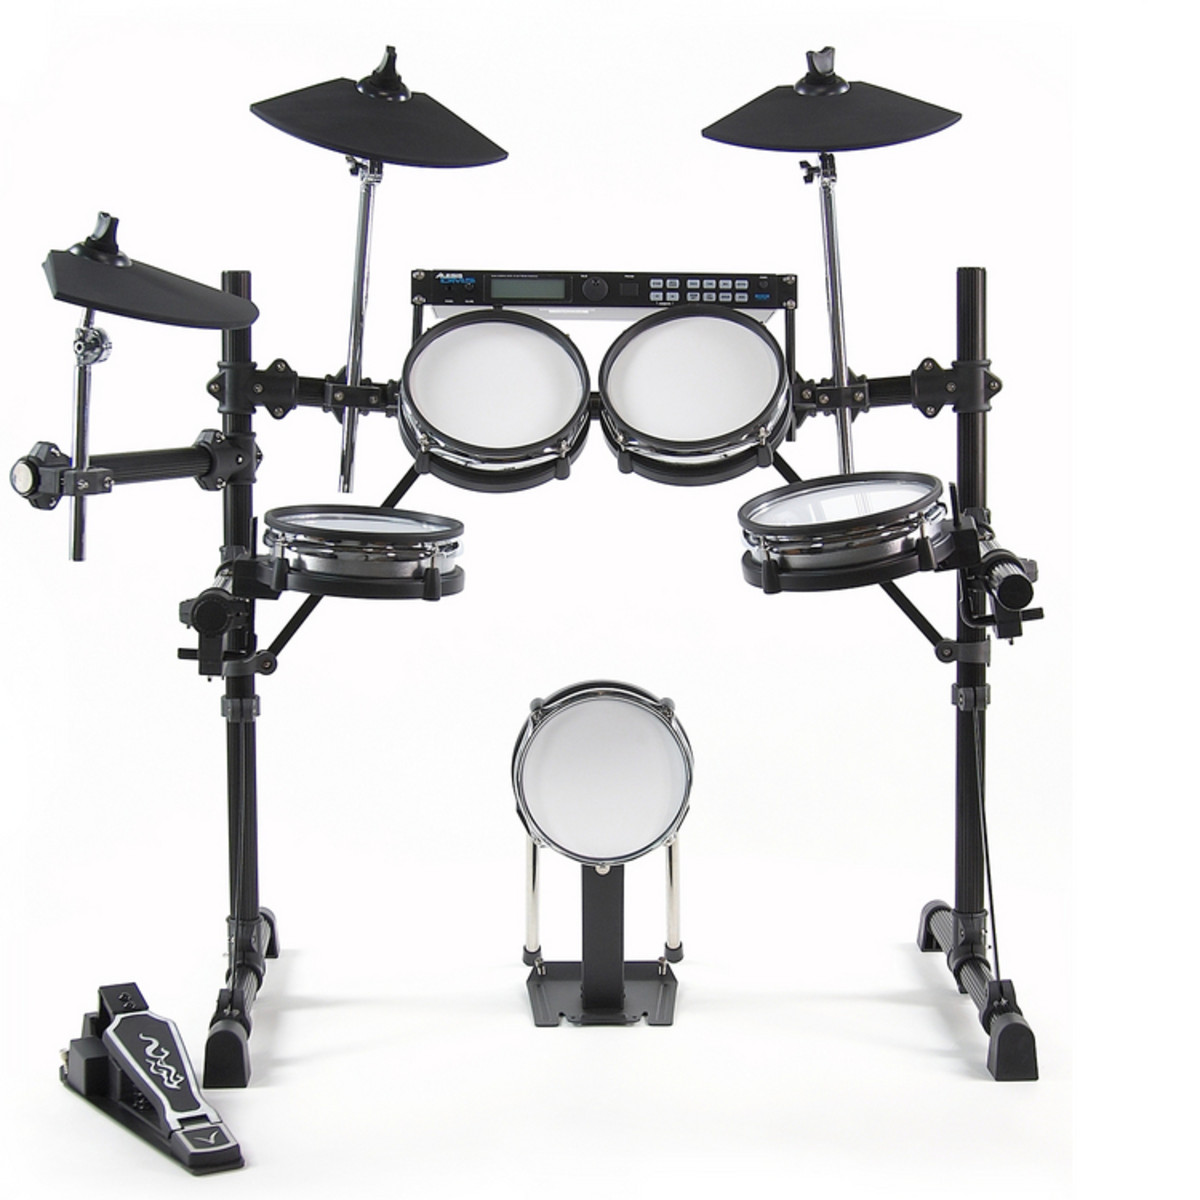 discontinued alesis dm5 pro electronic drum kit at. Black Bedroom Furniture Sets. Home Design Ideas